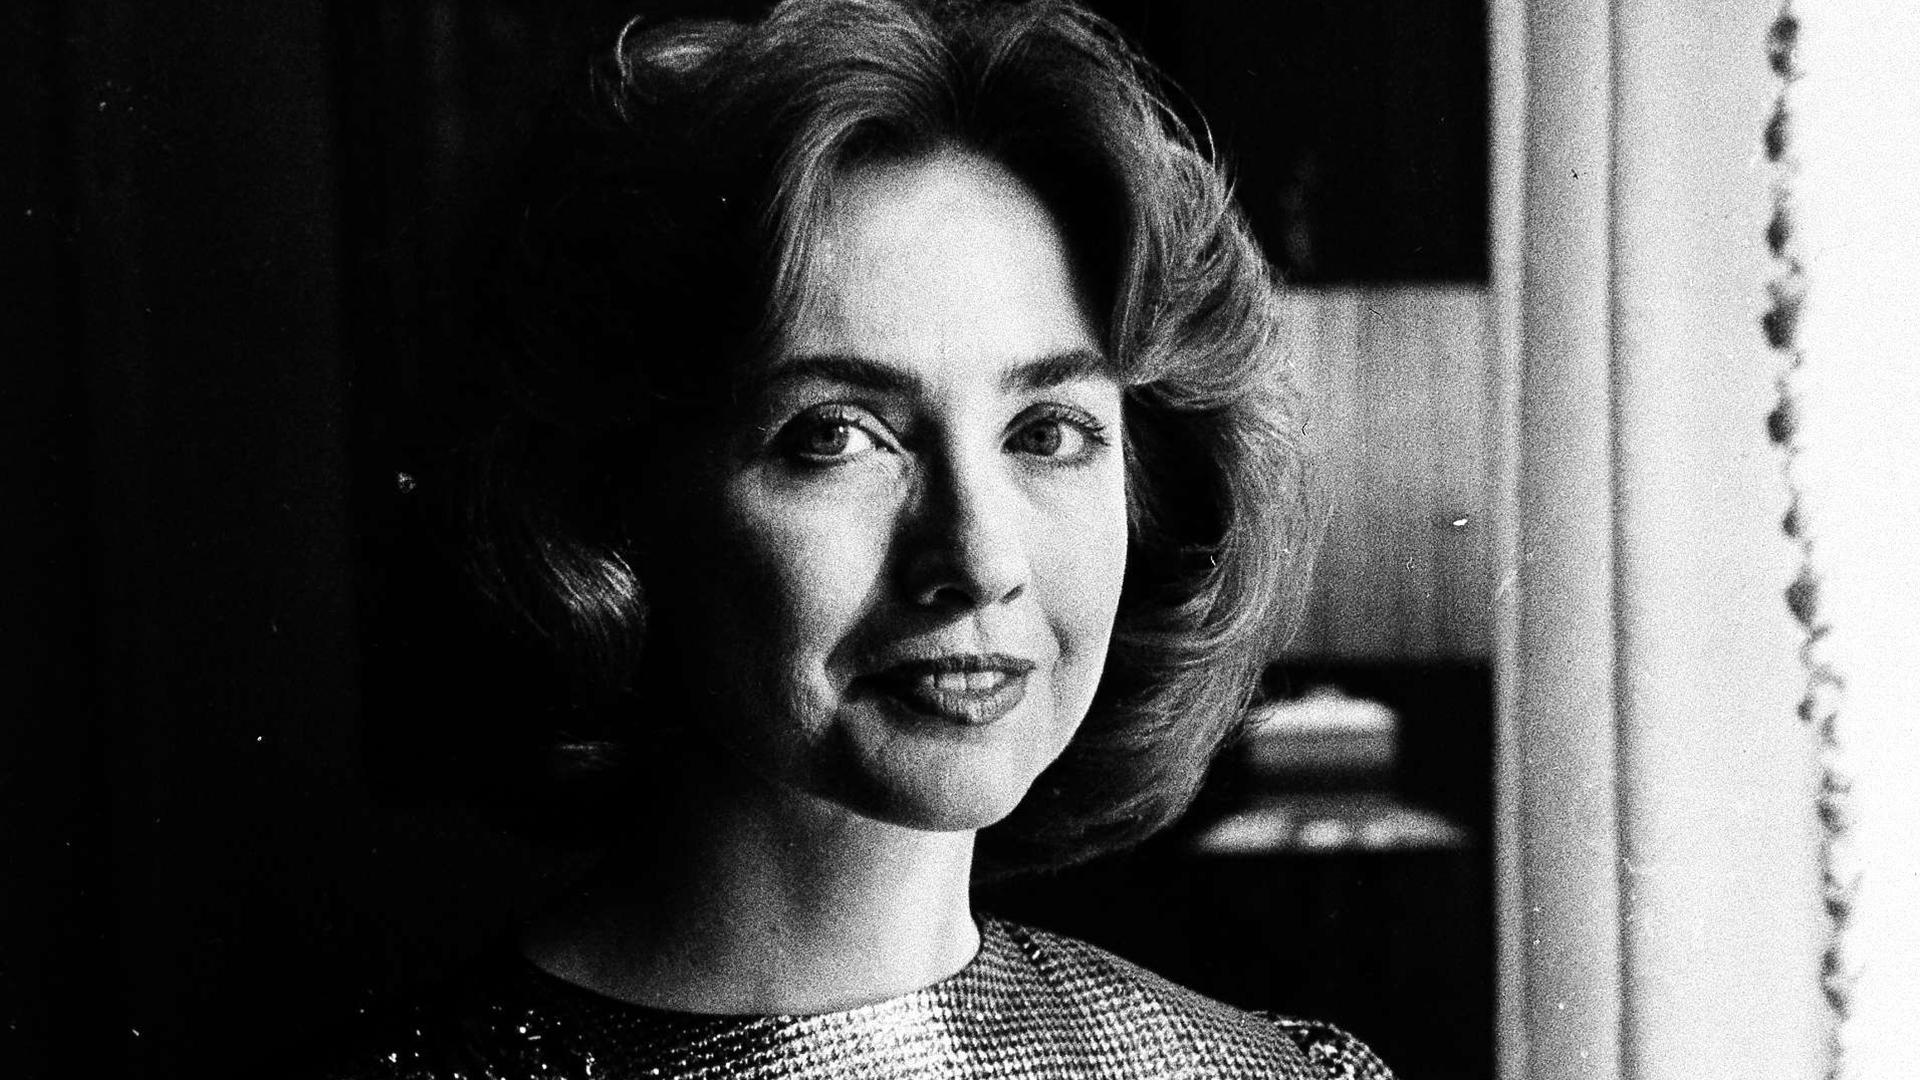 один молодая хиллари клинтон фото том, что